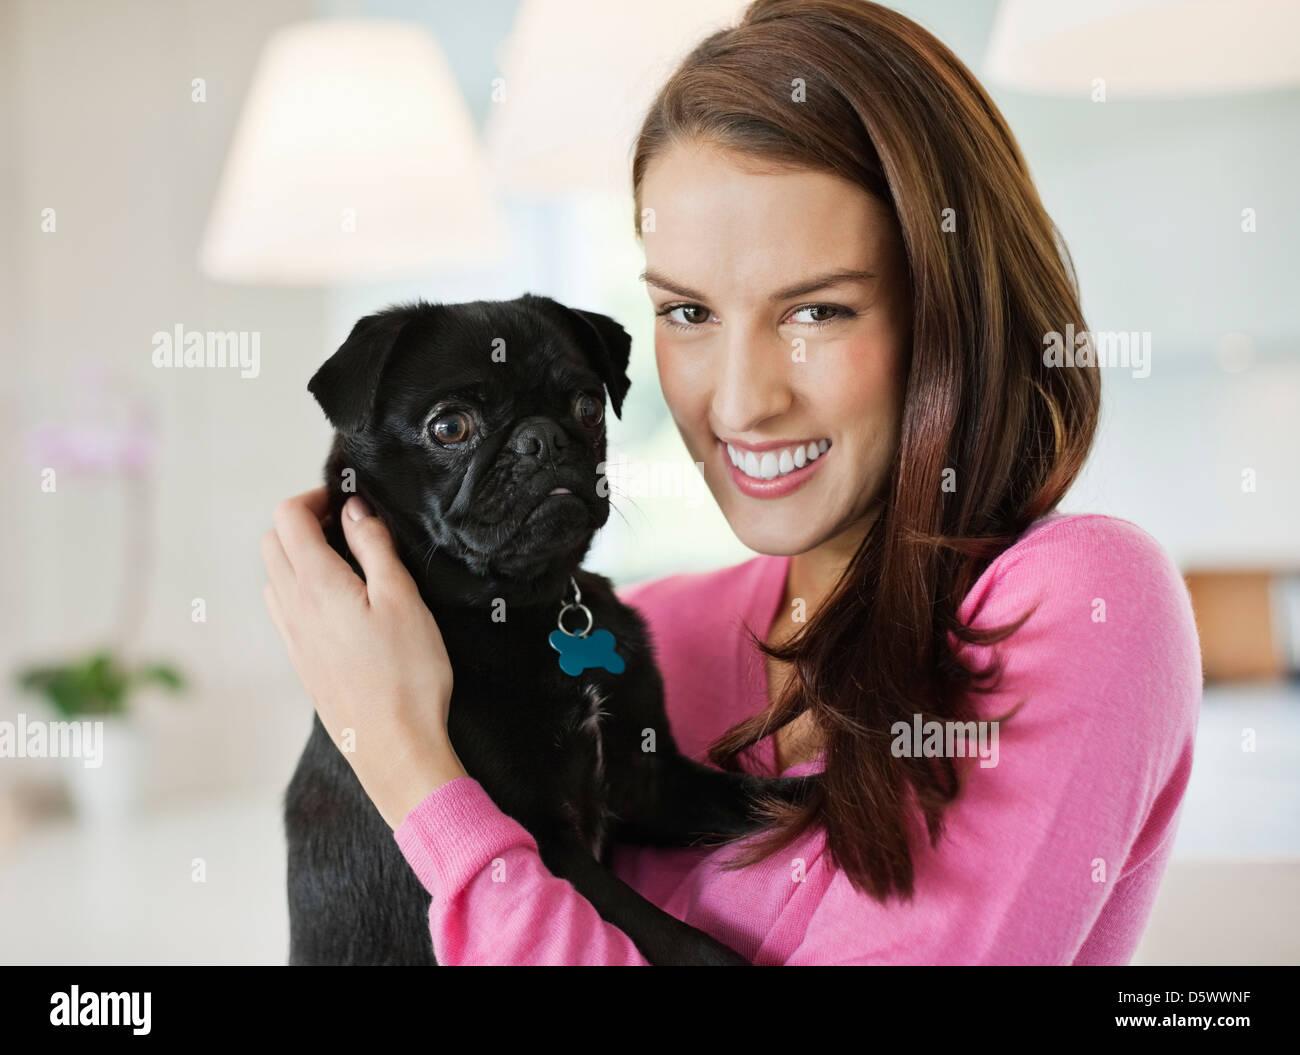 Smiling woman holding dog indoors - Stock Image